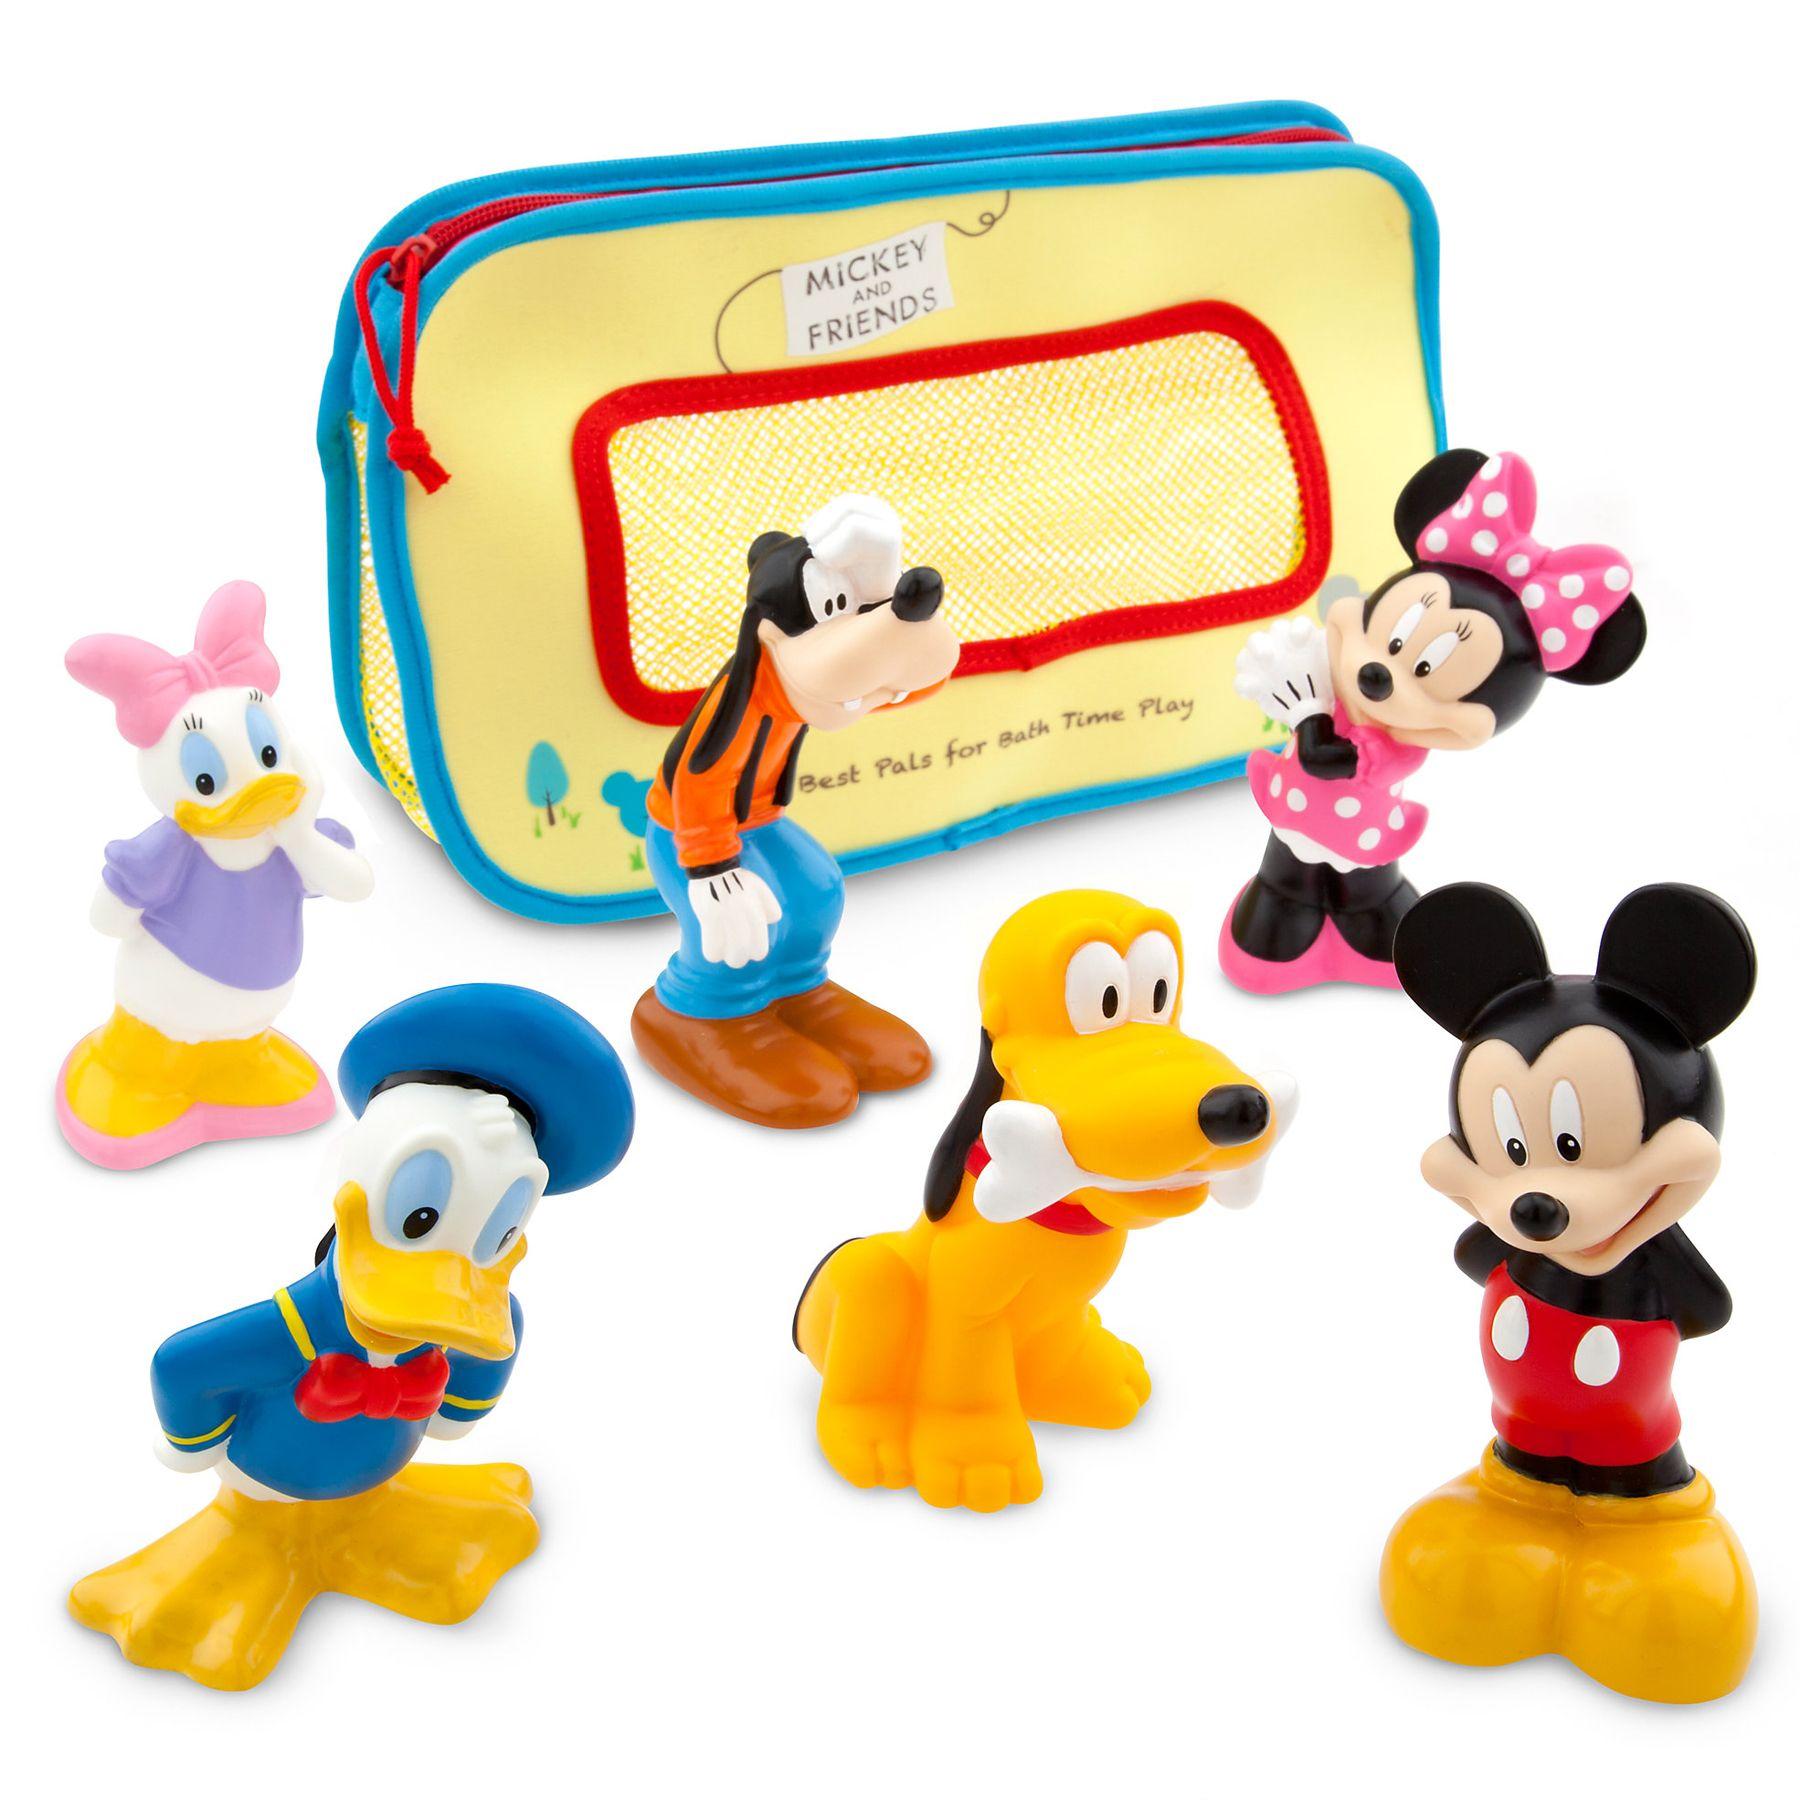 Mickey and Friends Bath Toys | My sweet boy | Pinterest | Bath toys ...